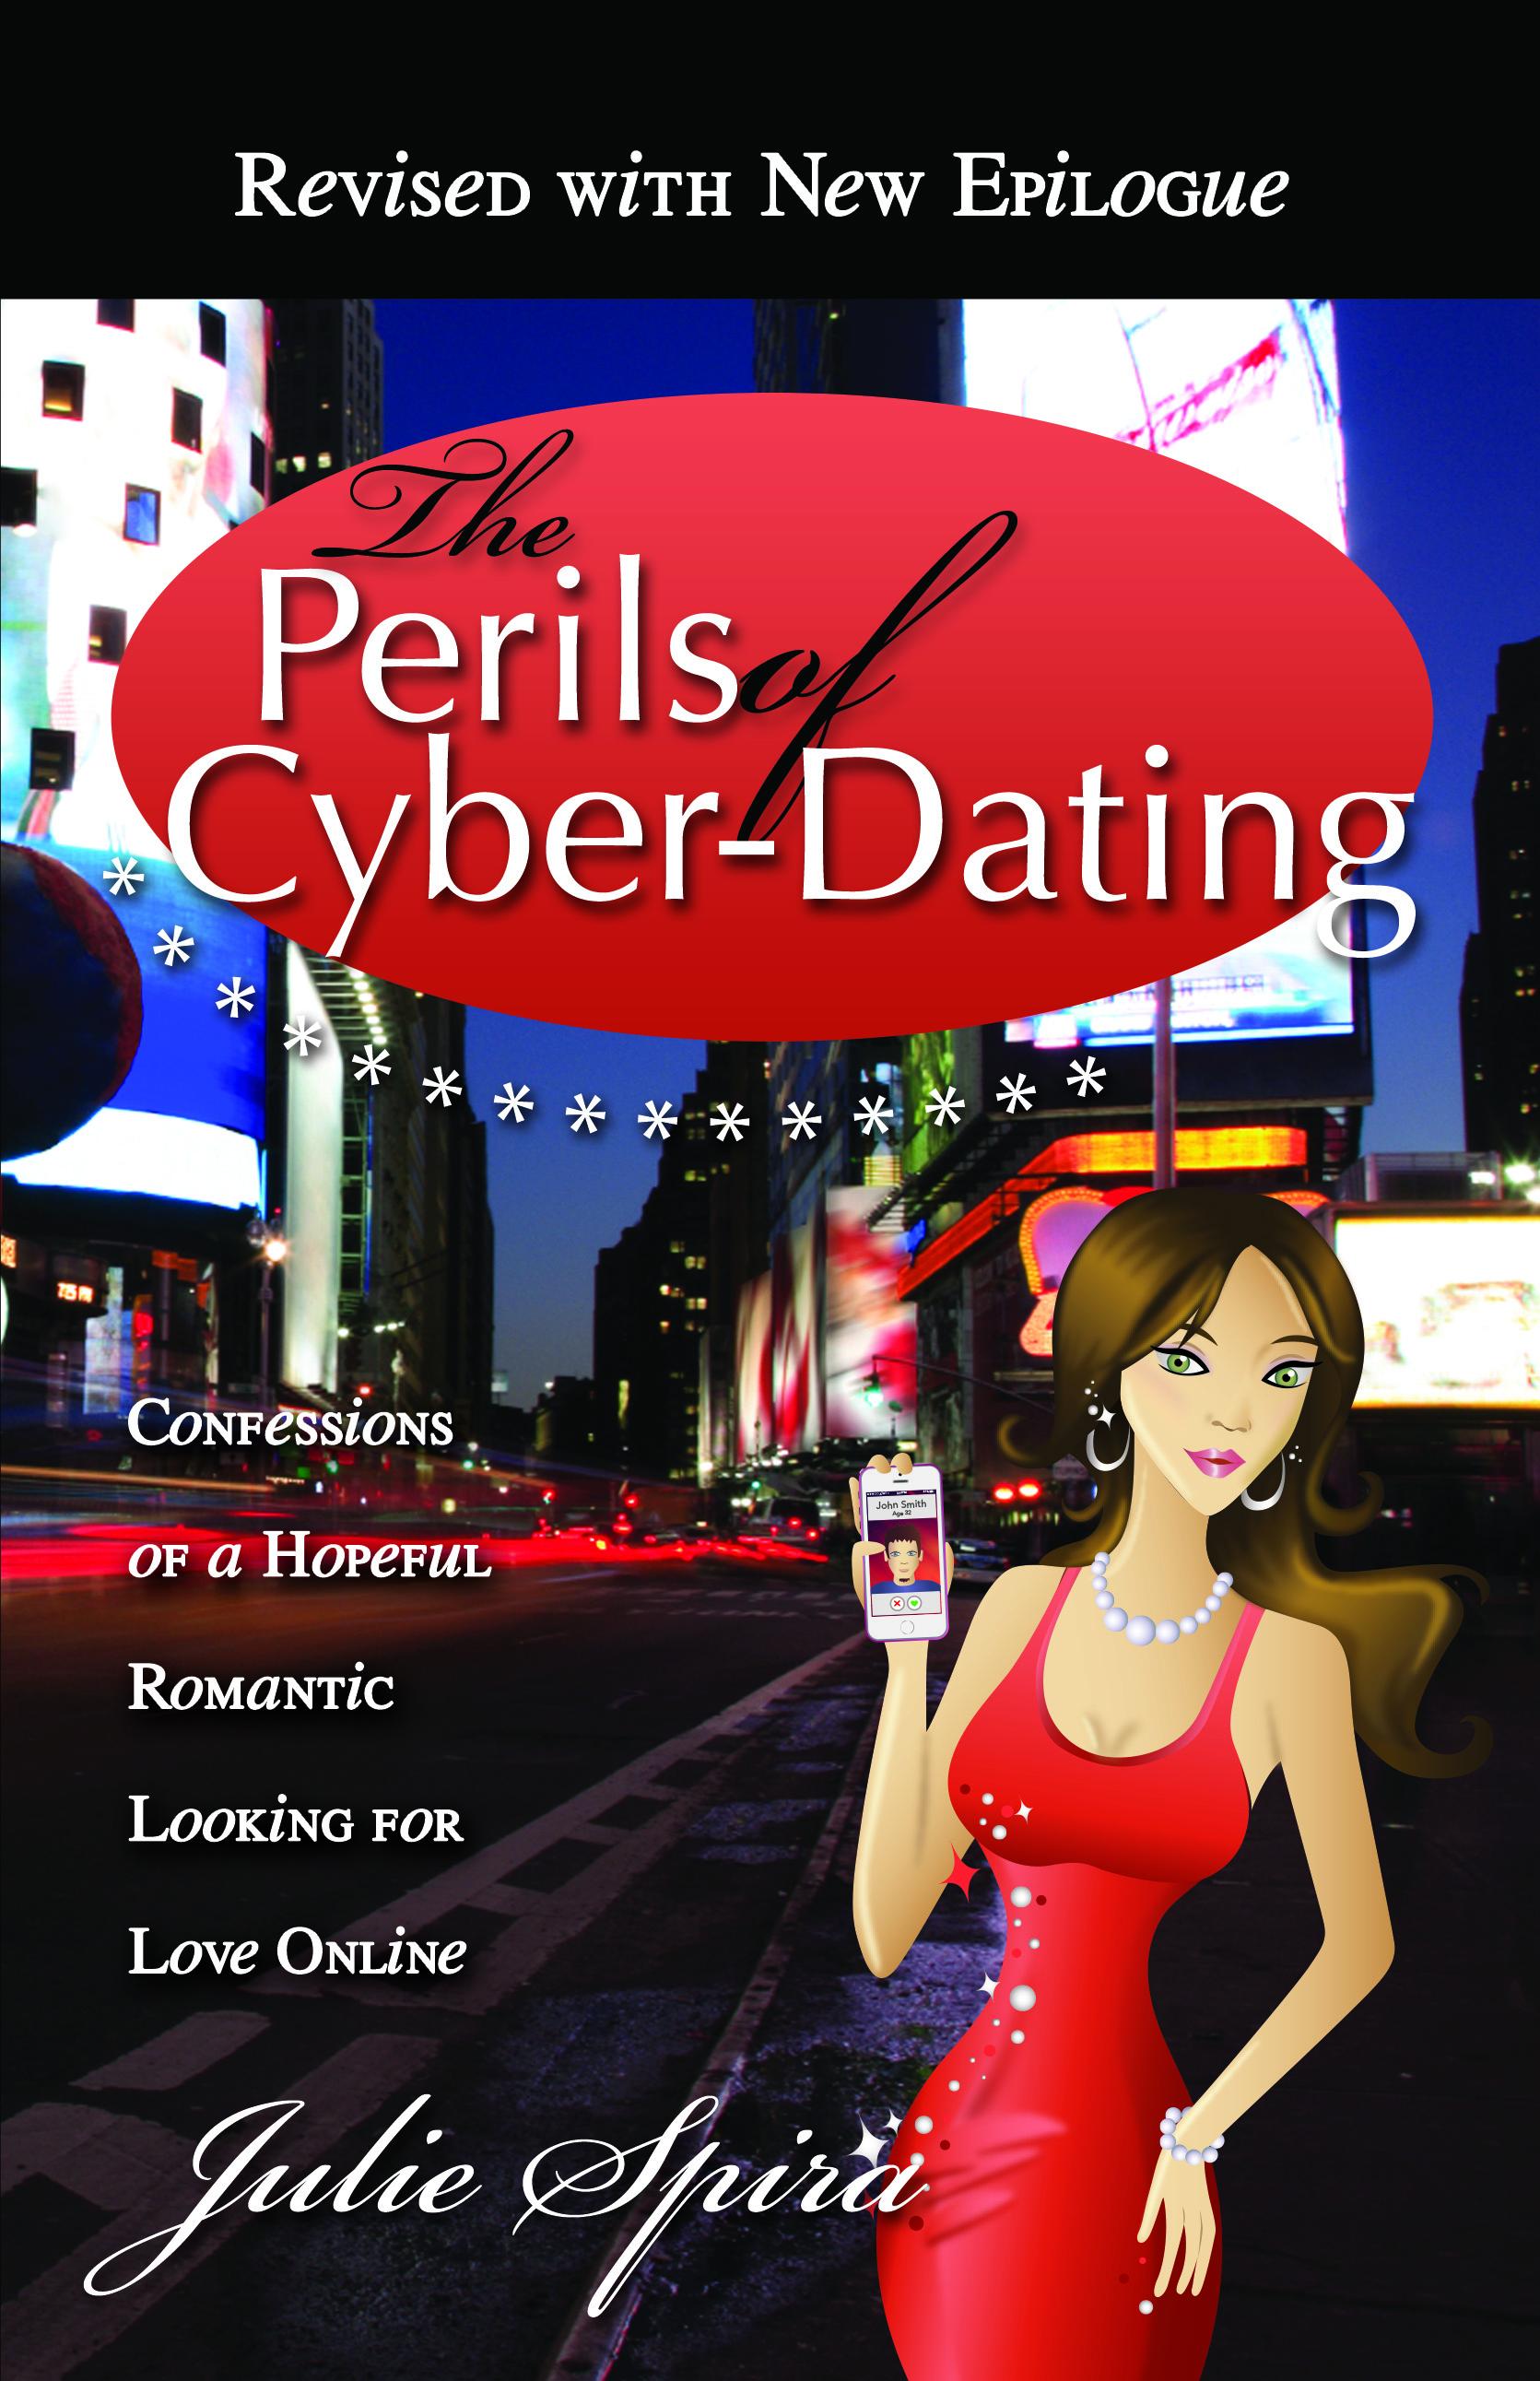 Cyber dating expert